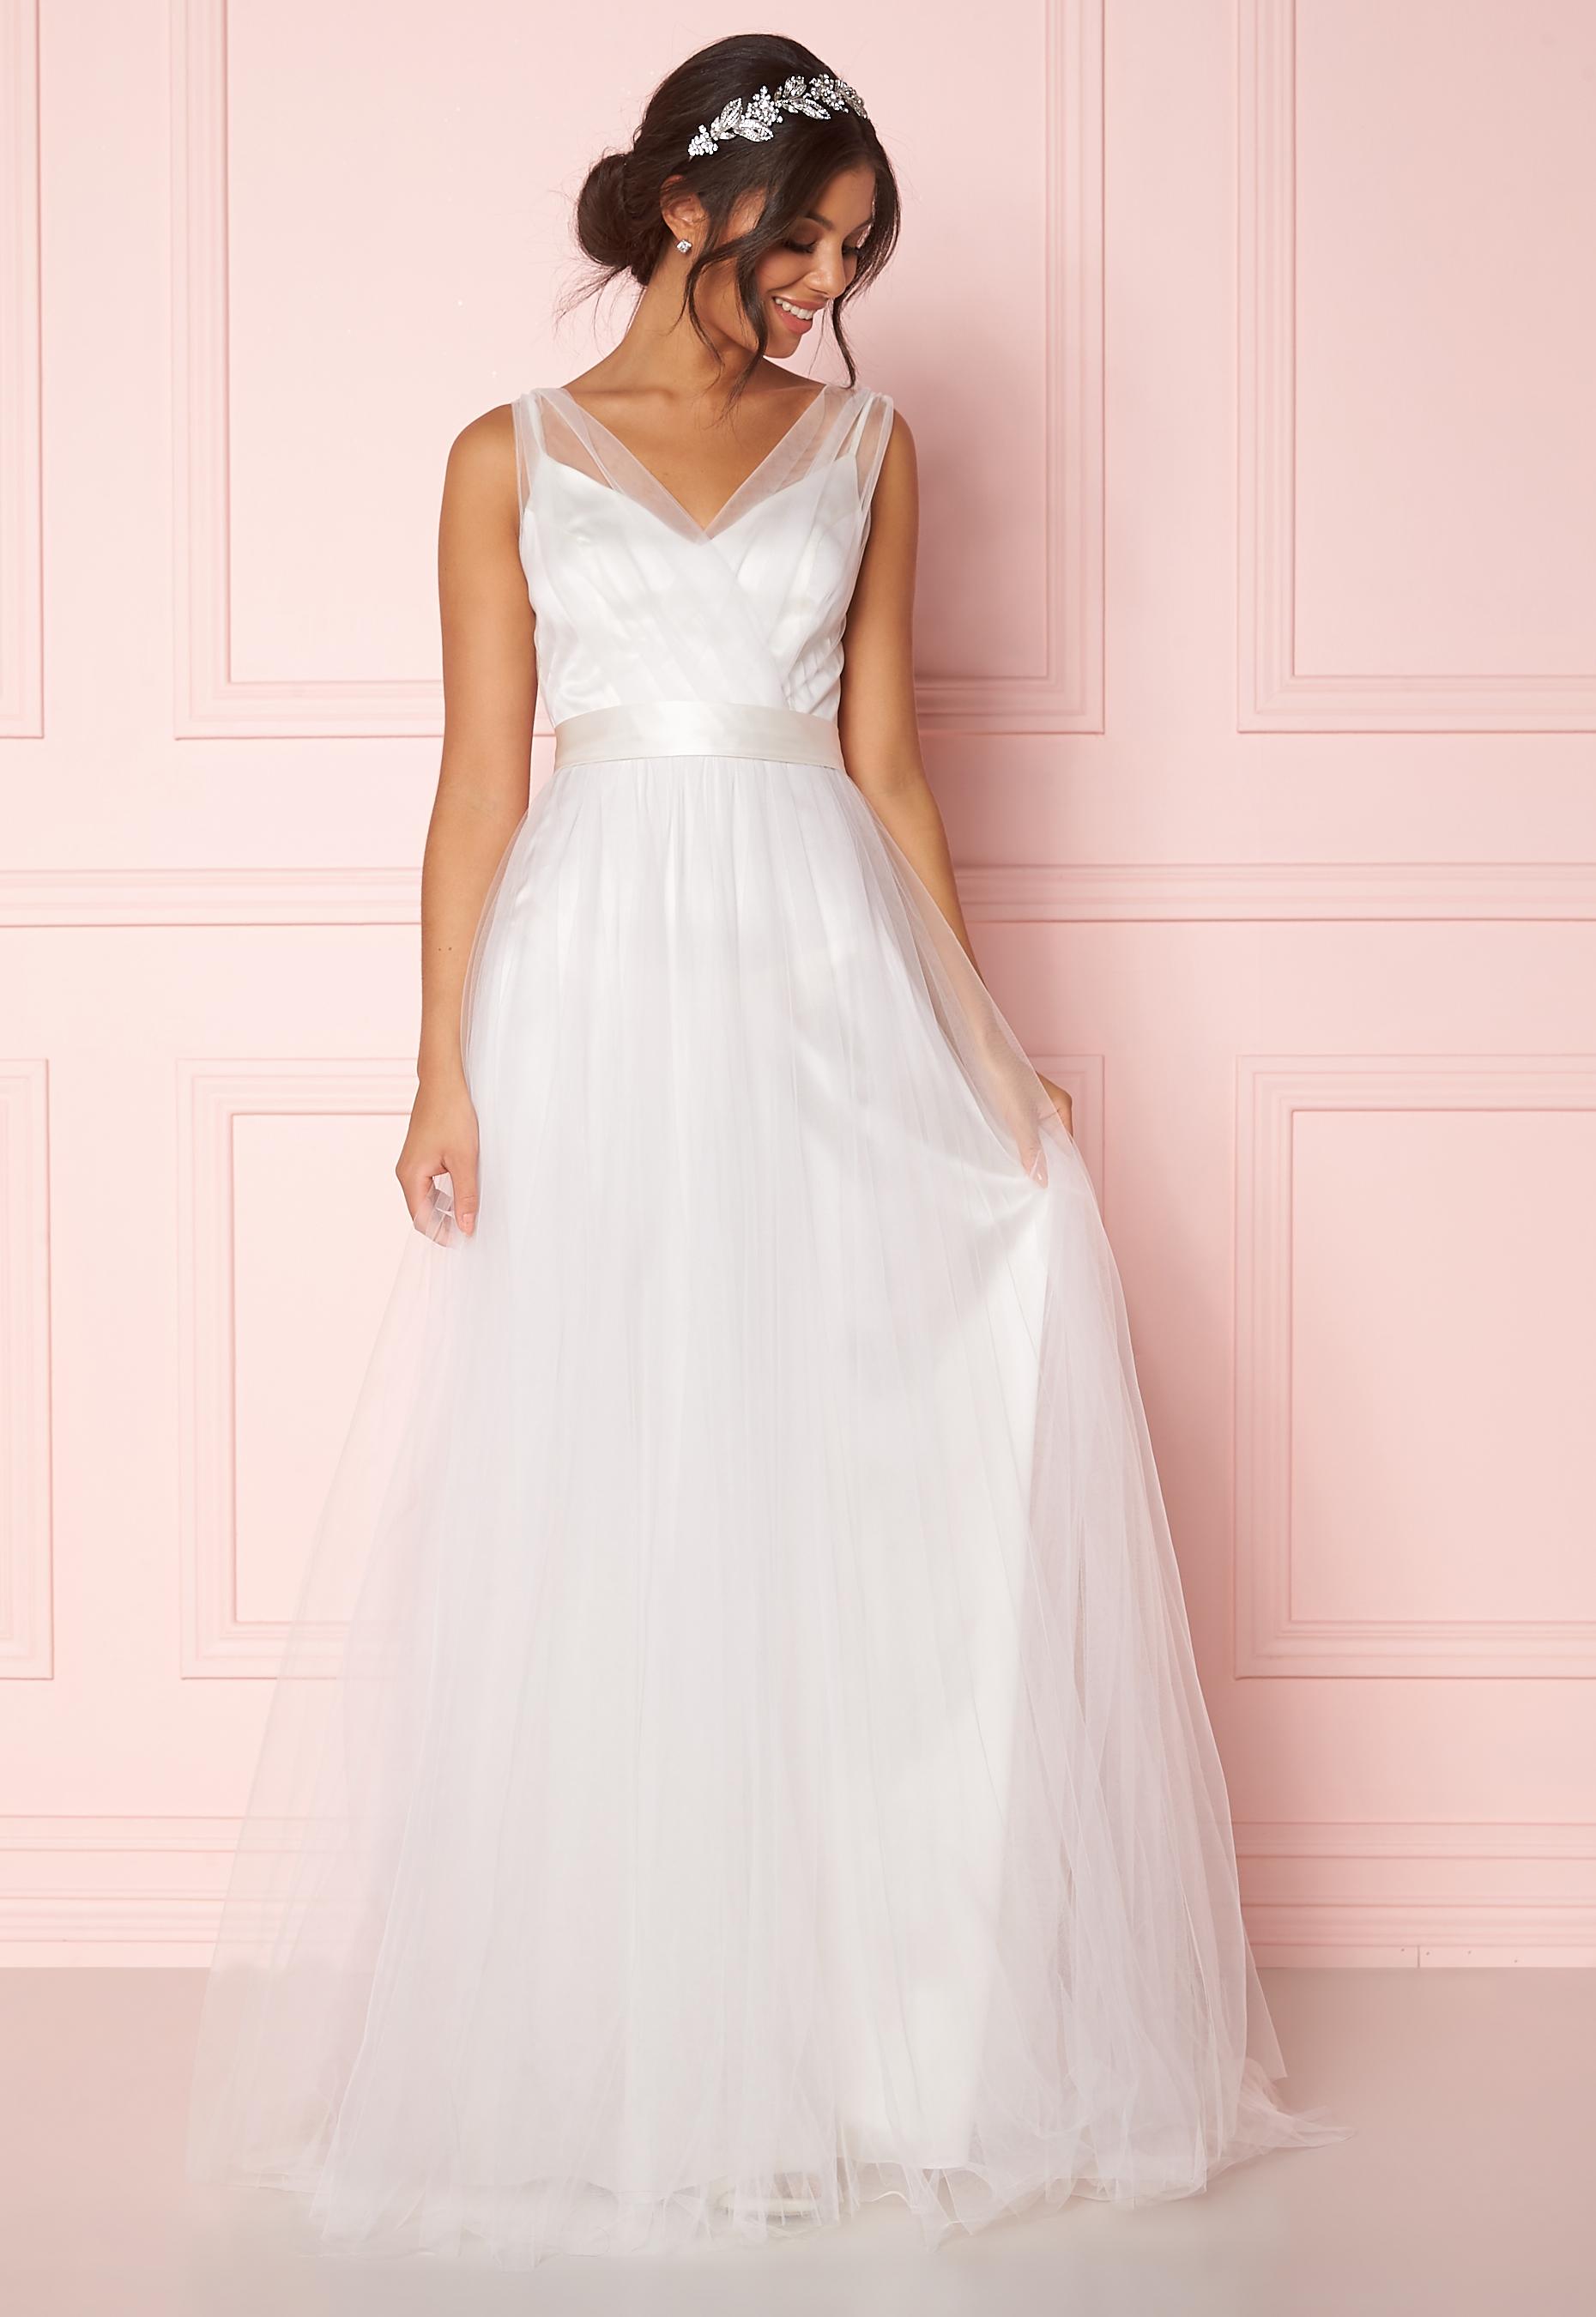 b316f0c85e99 Zetterberg Couture Nadja Long Bridal Dress Ivory - Bubbleroom